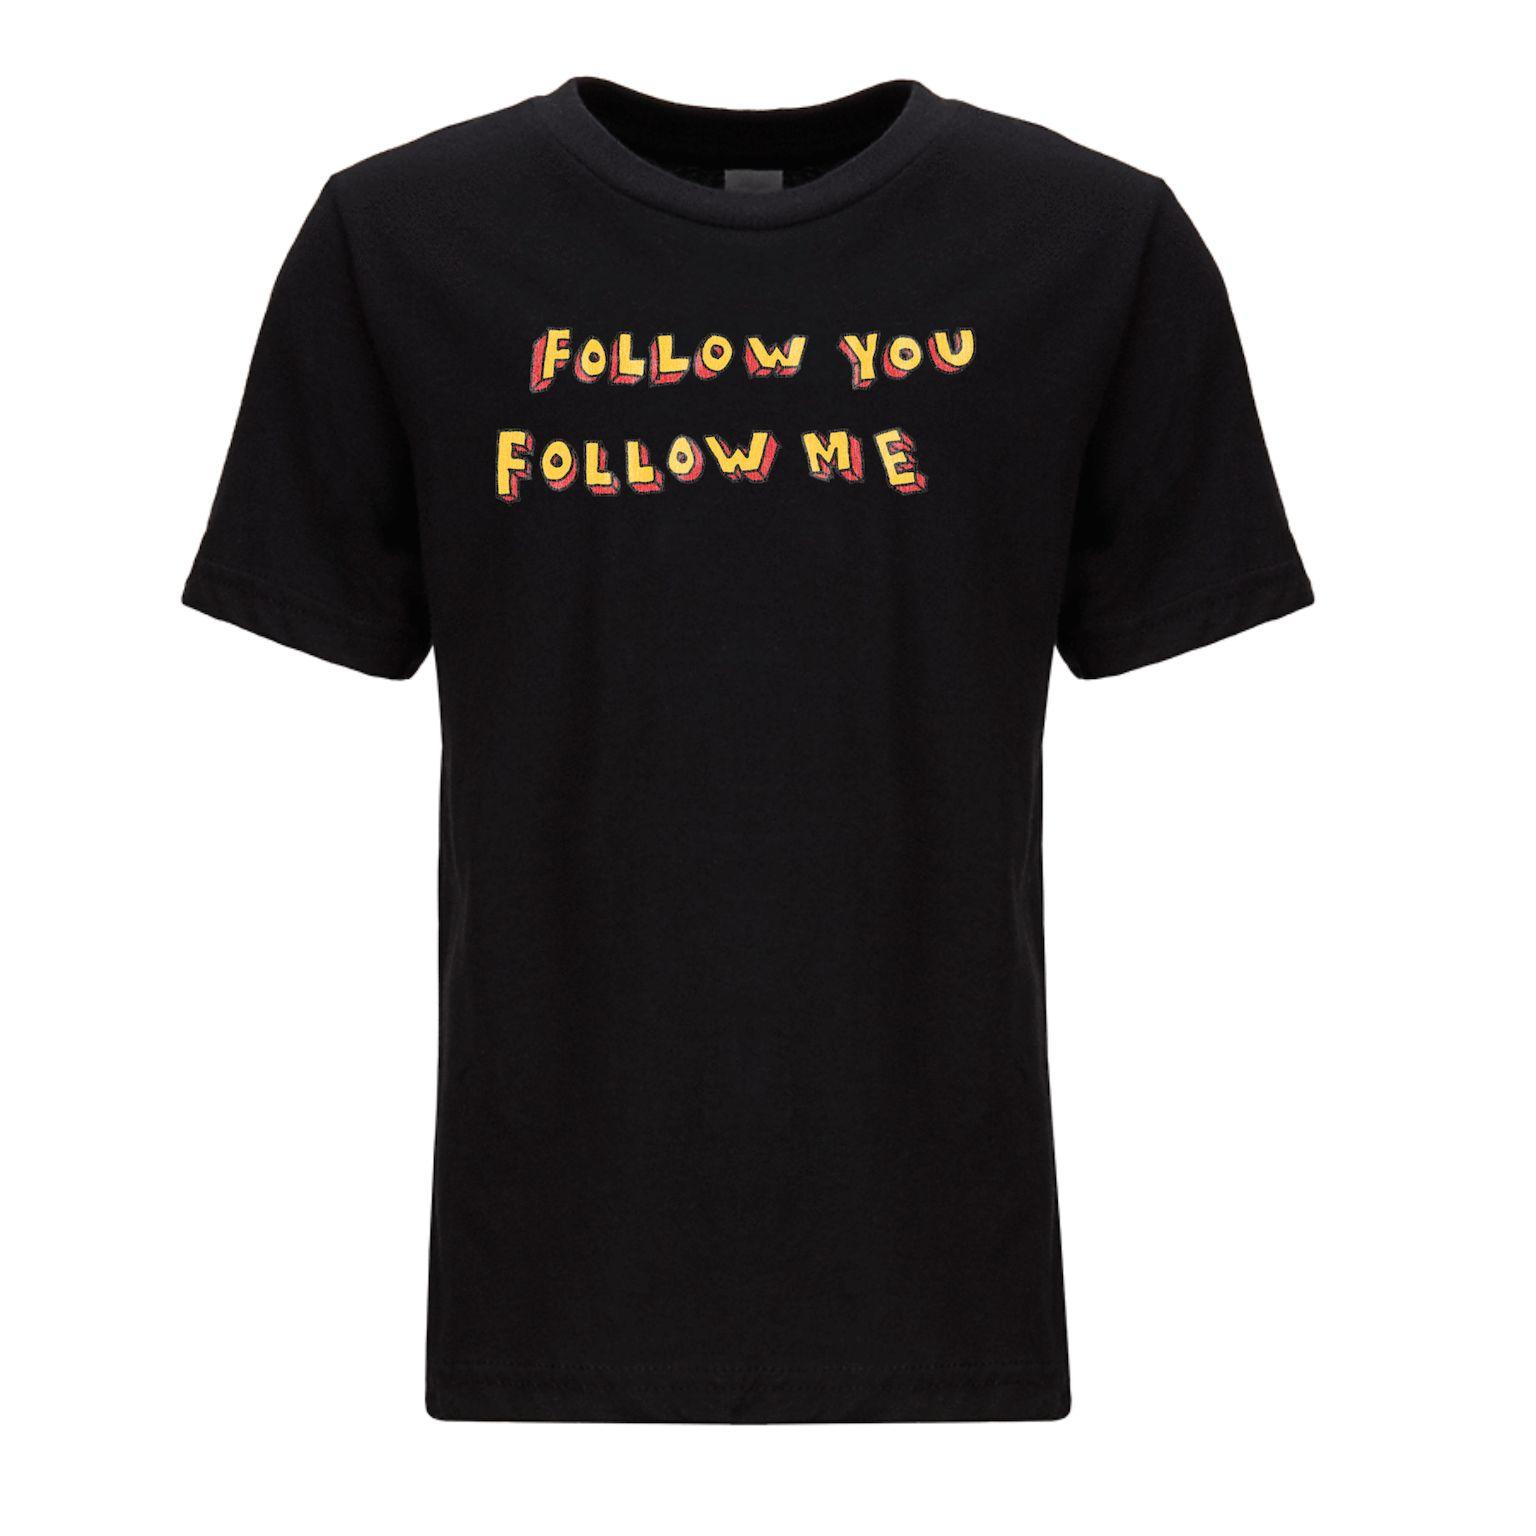 Follow You, Follow Me Youth Tee